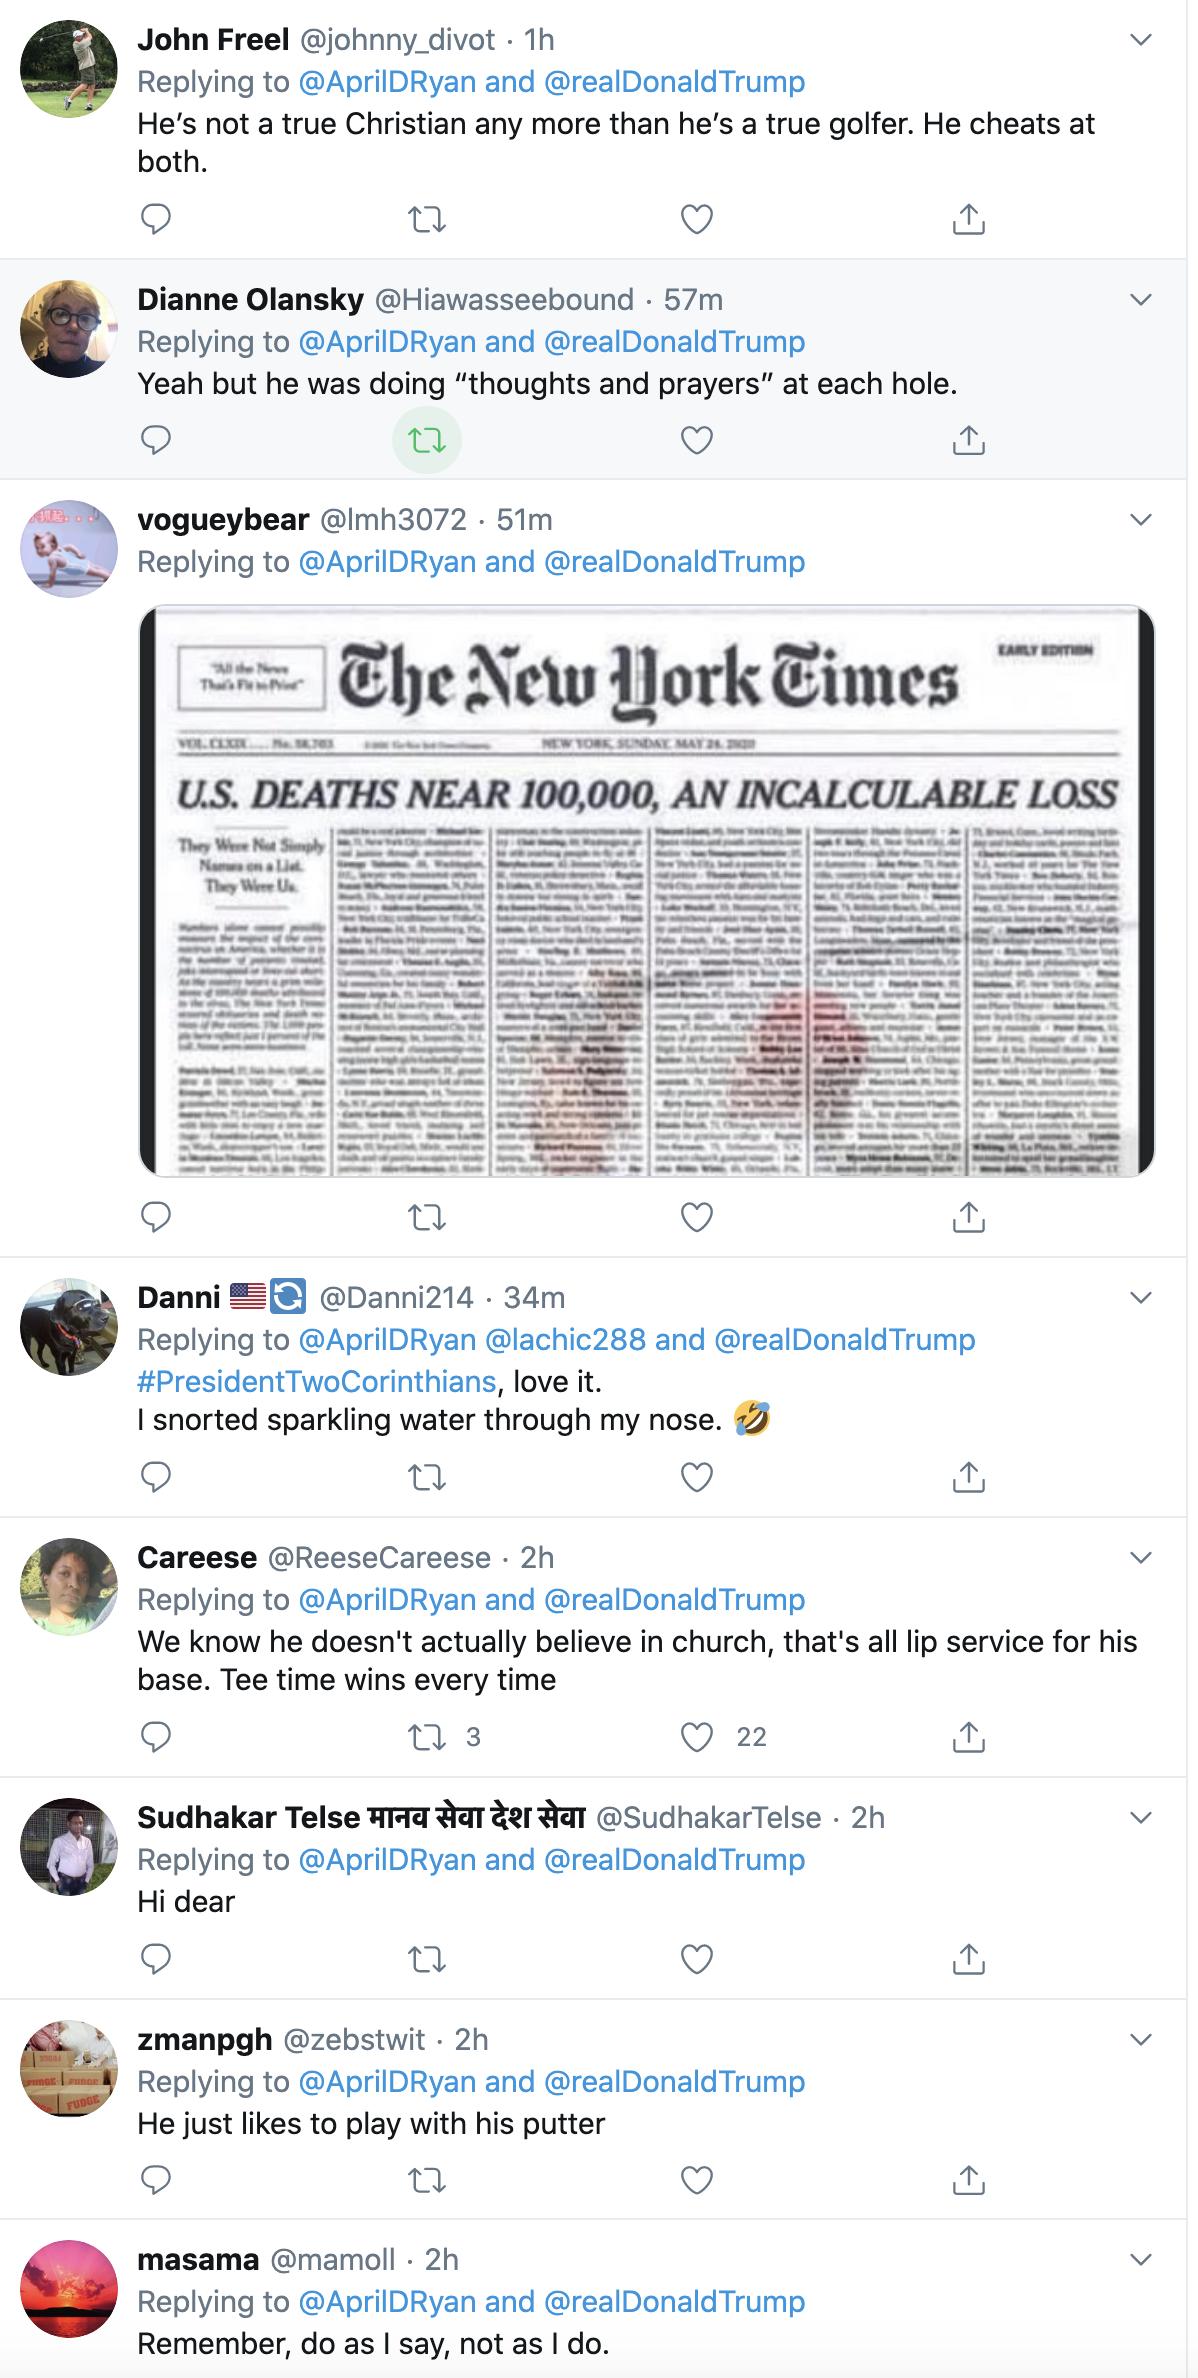 Screen-Shot-2020-05-24-at-3.18.09-PM Trump's Shameful Sunday Activities Caught On Camera Coronavirus Featured Politics Sports Top Stories